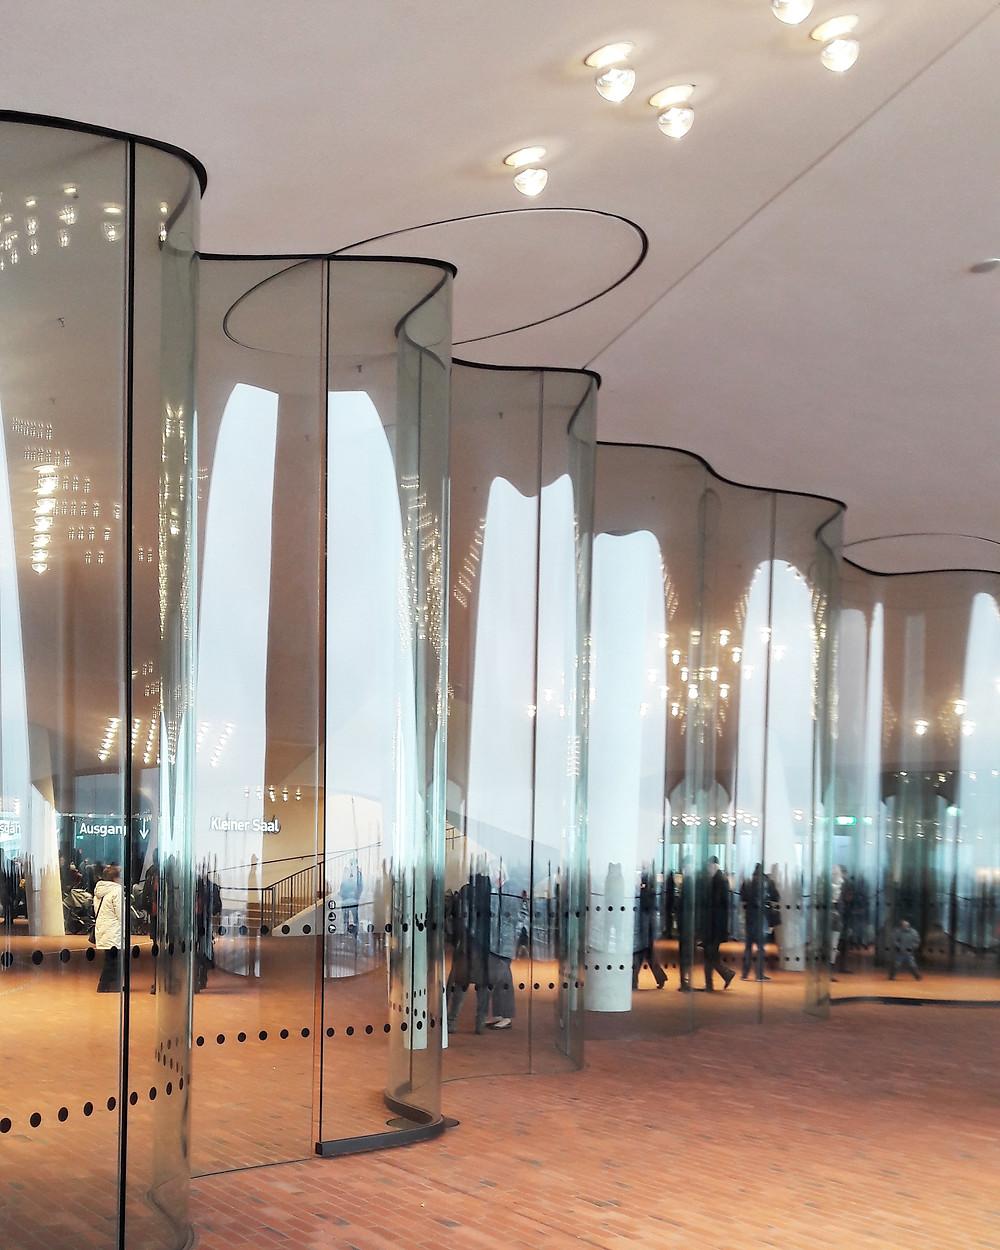 Elbphilharmonie interior